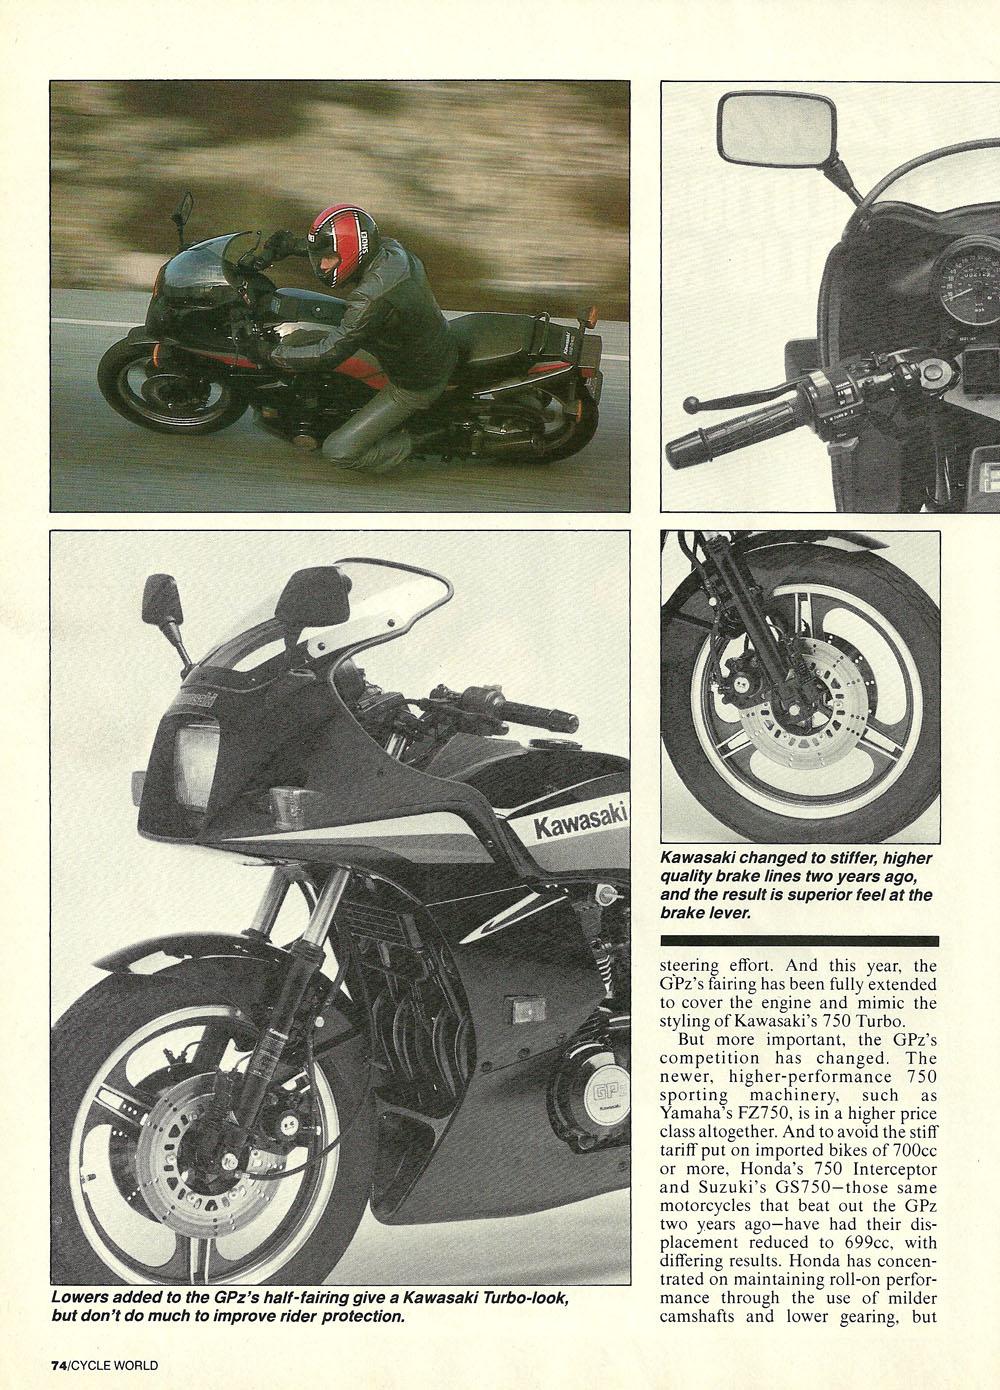 1985 Kawasaki GPz750 road test 02.jpg